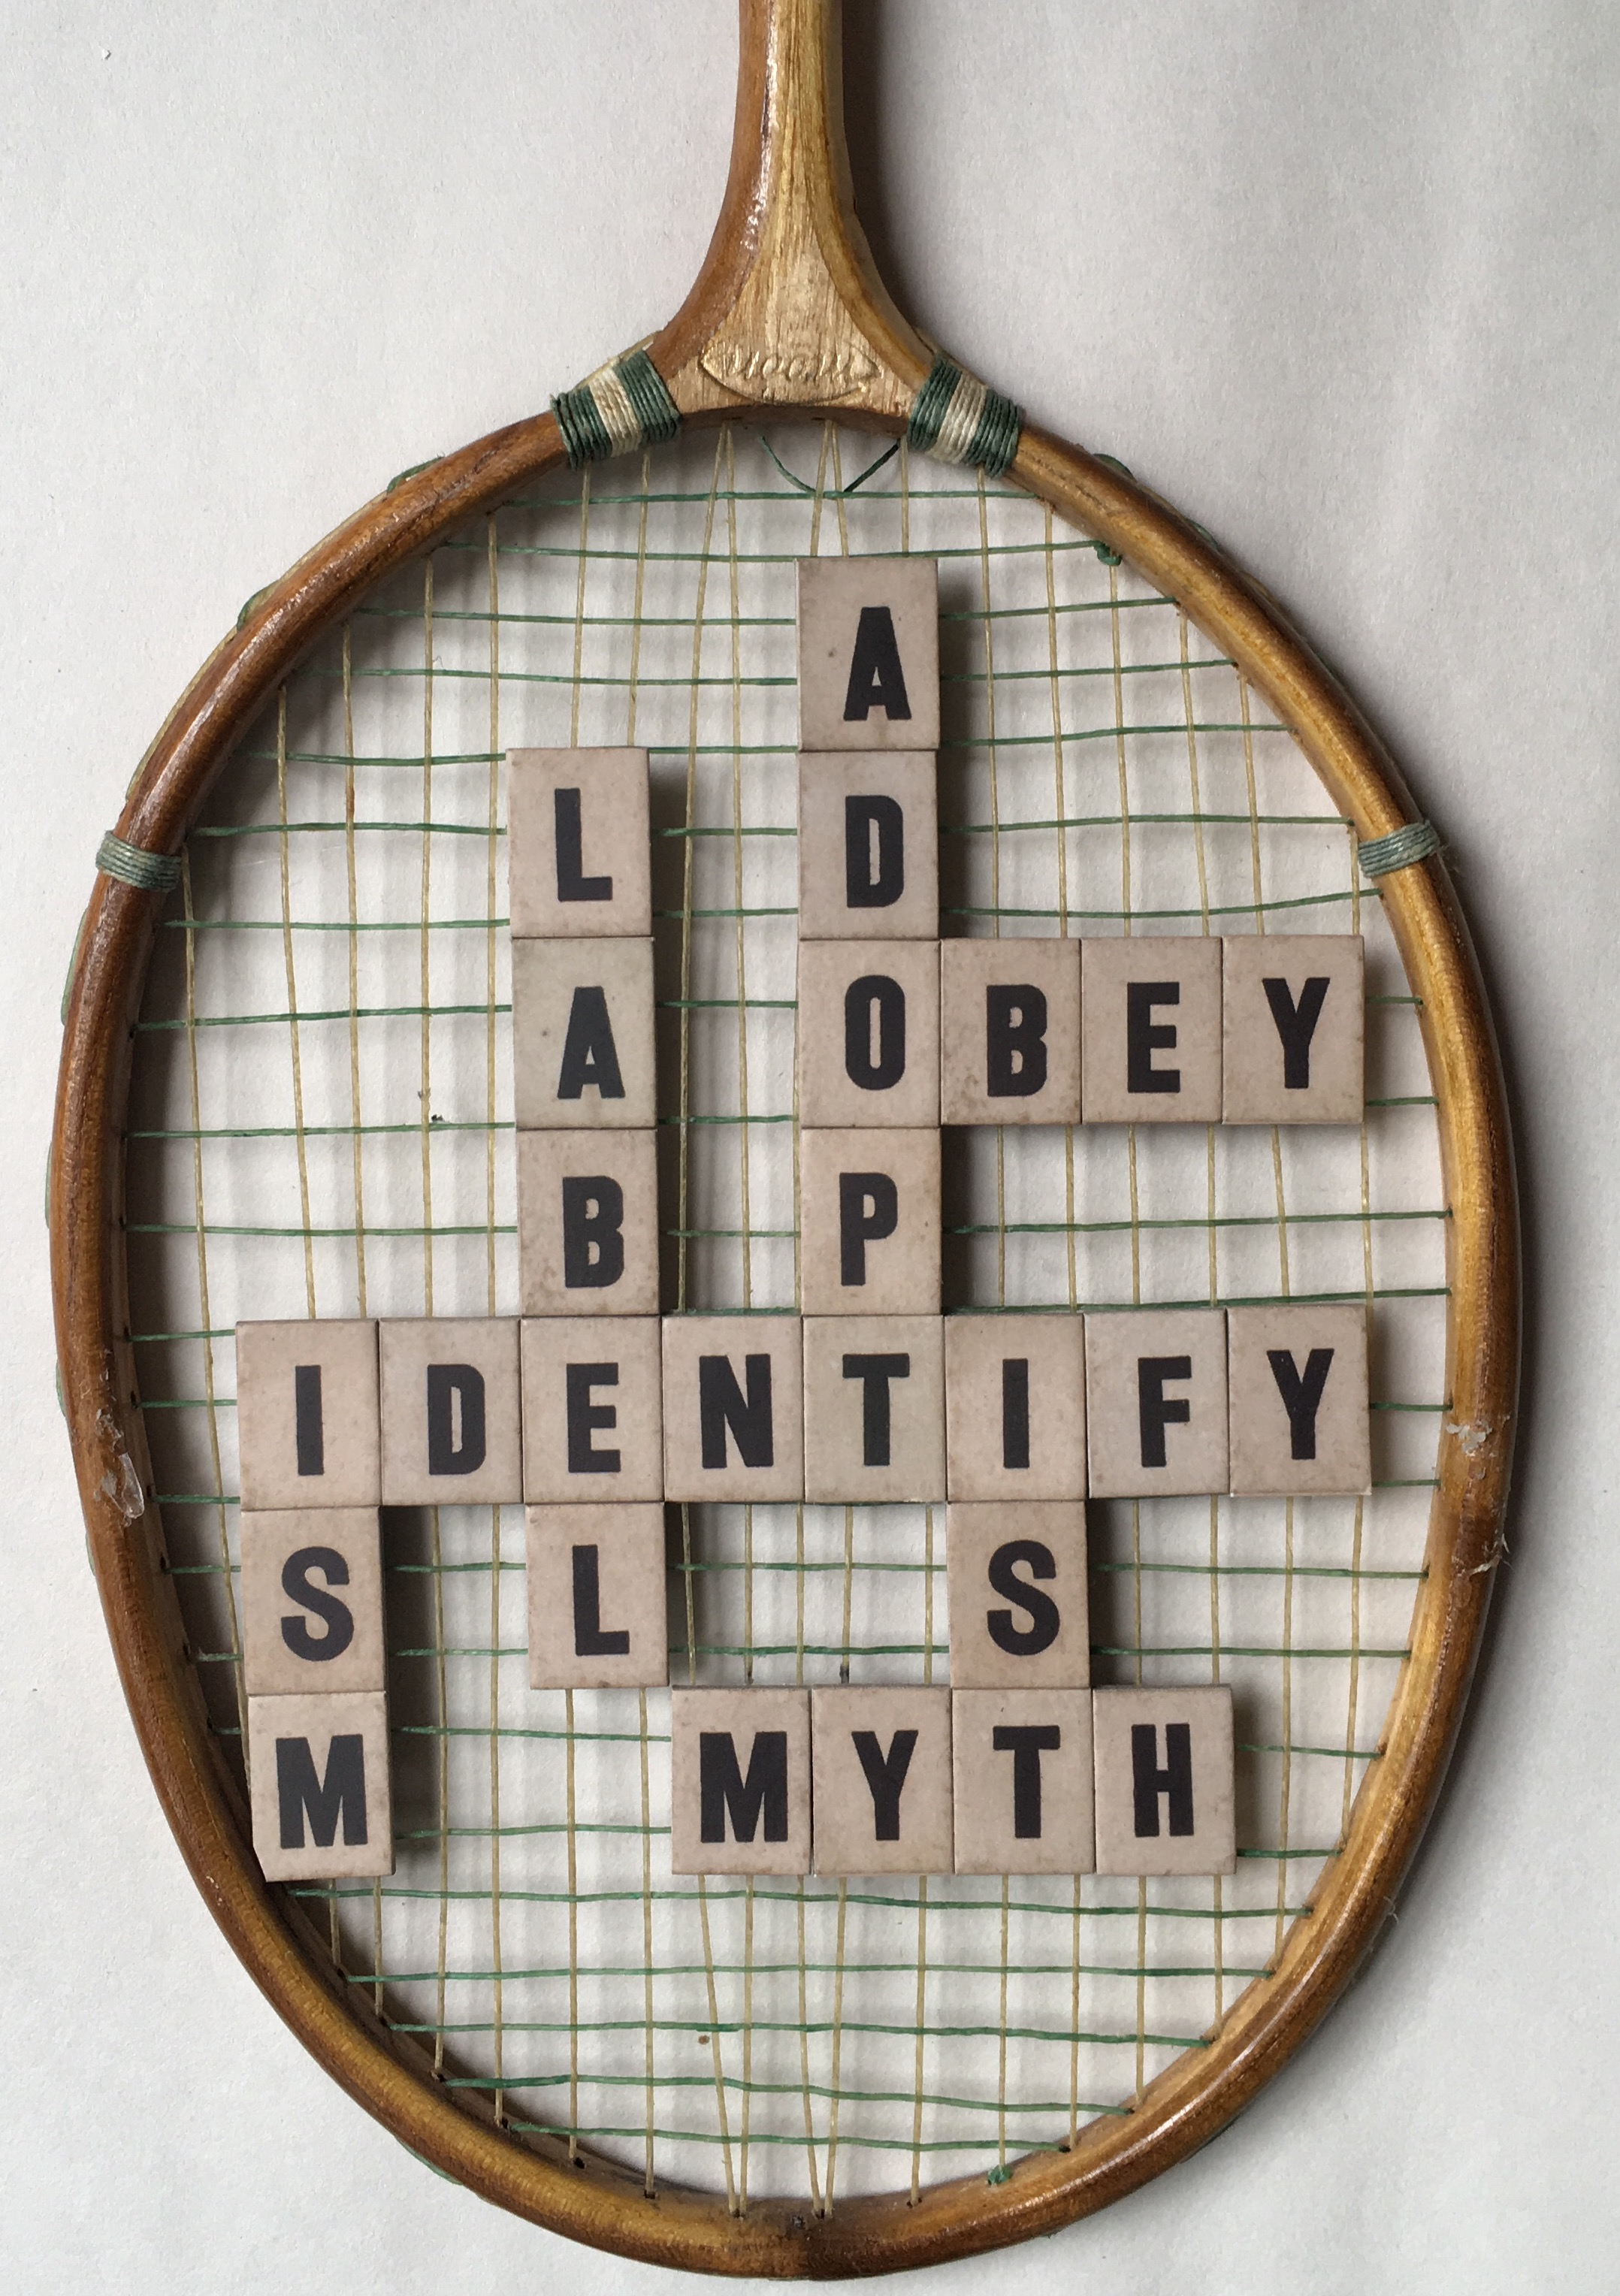 Labelism